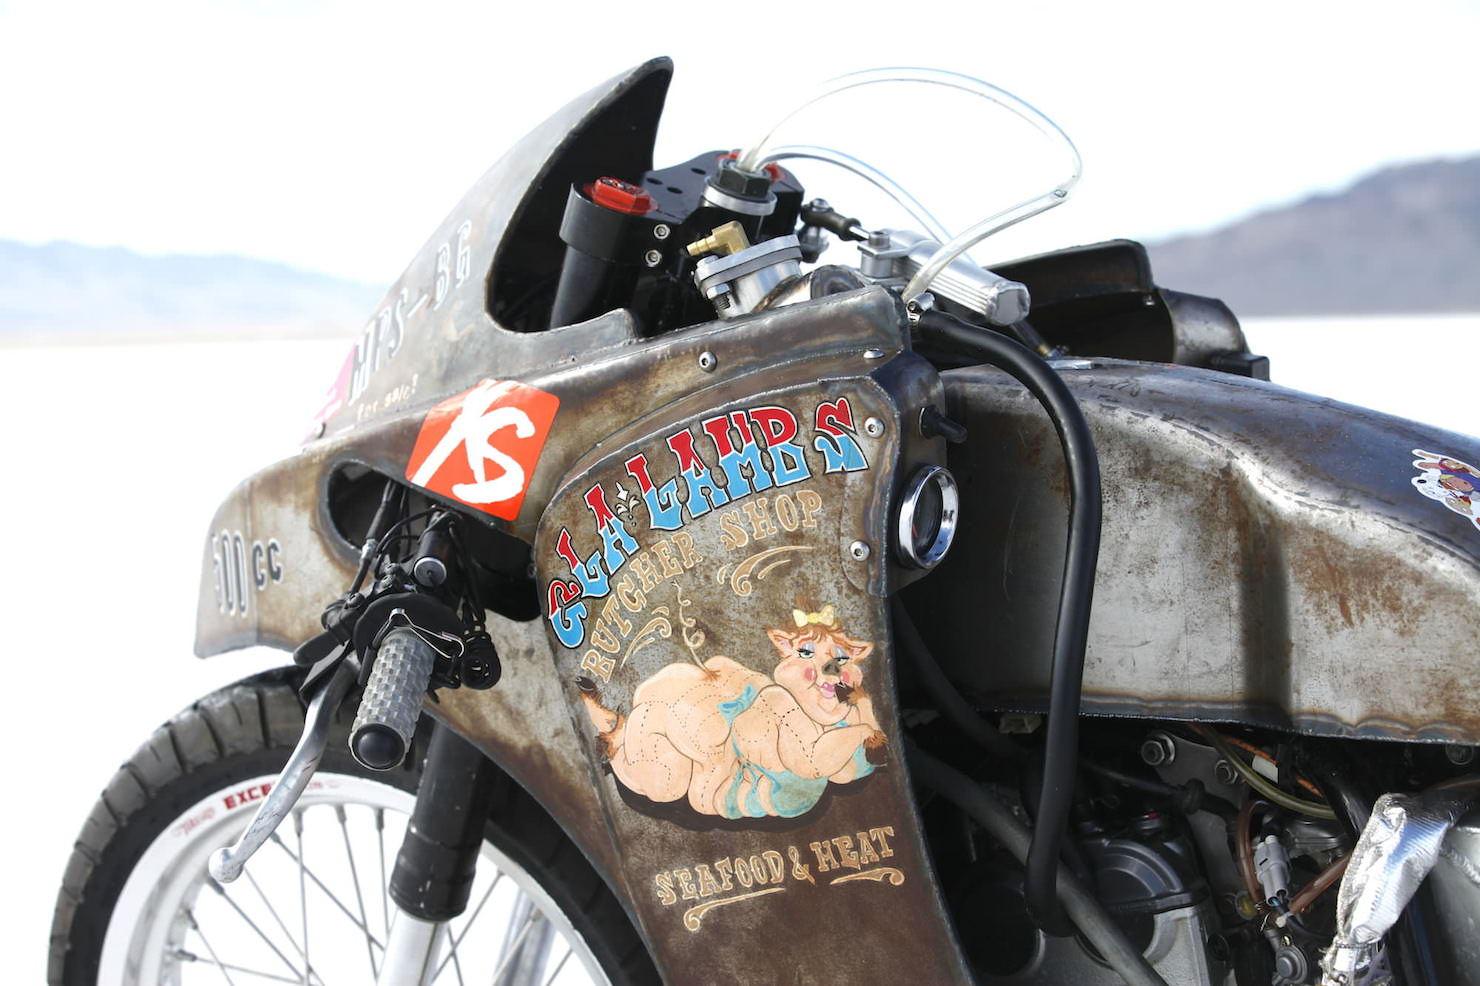 Turbo Yamaha Salt Flat Racer by Super Rat 2